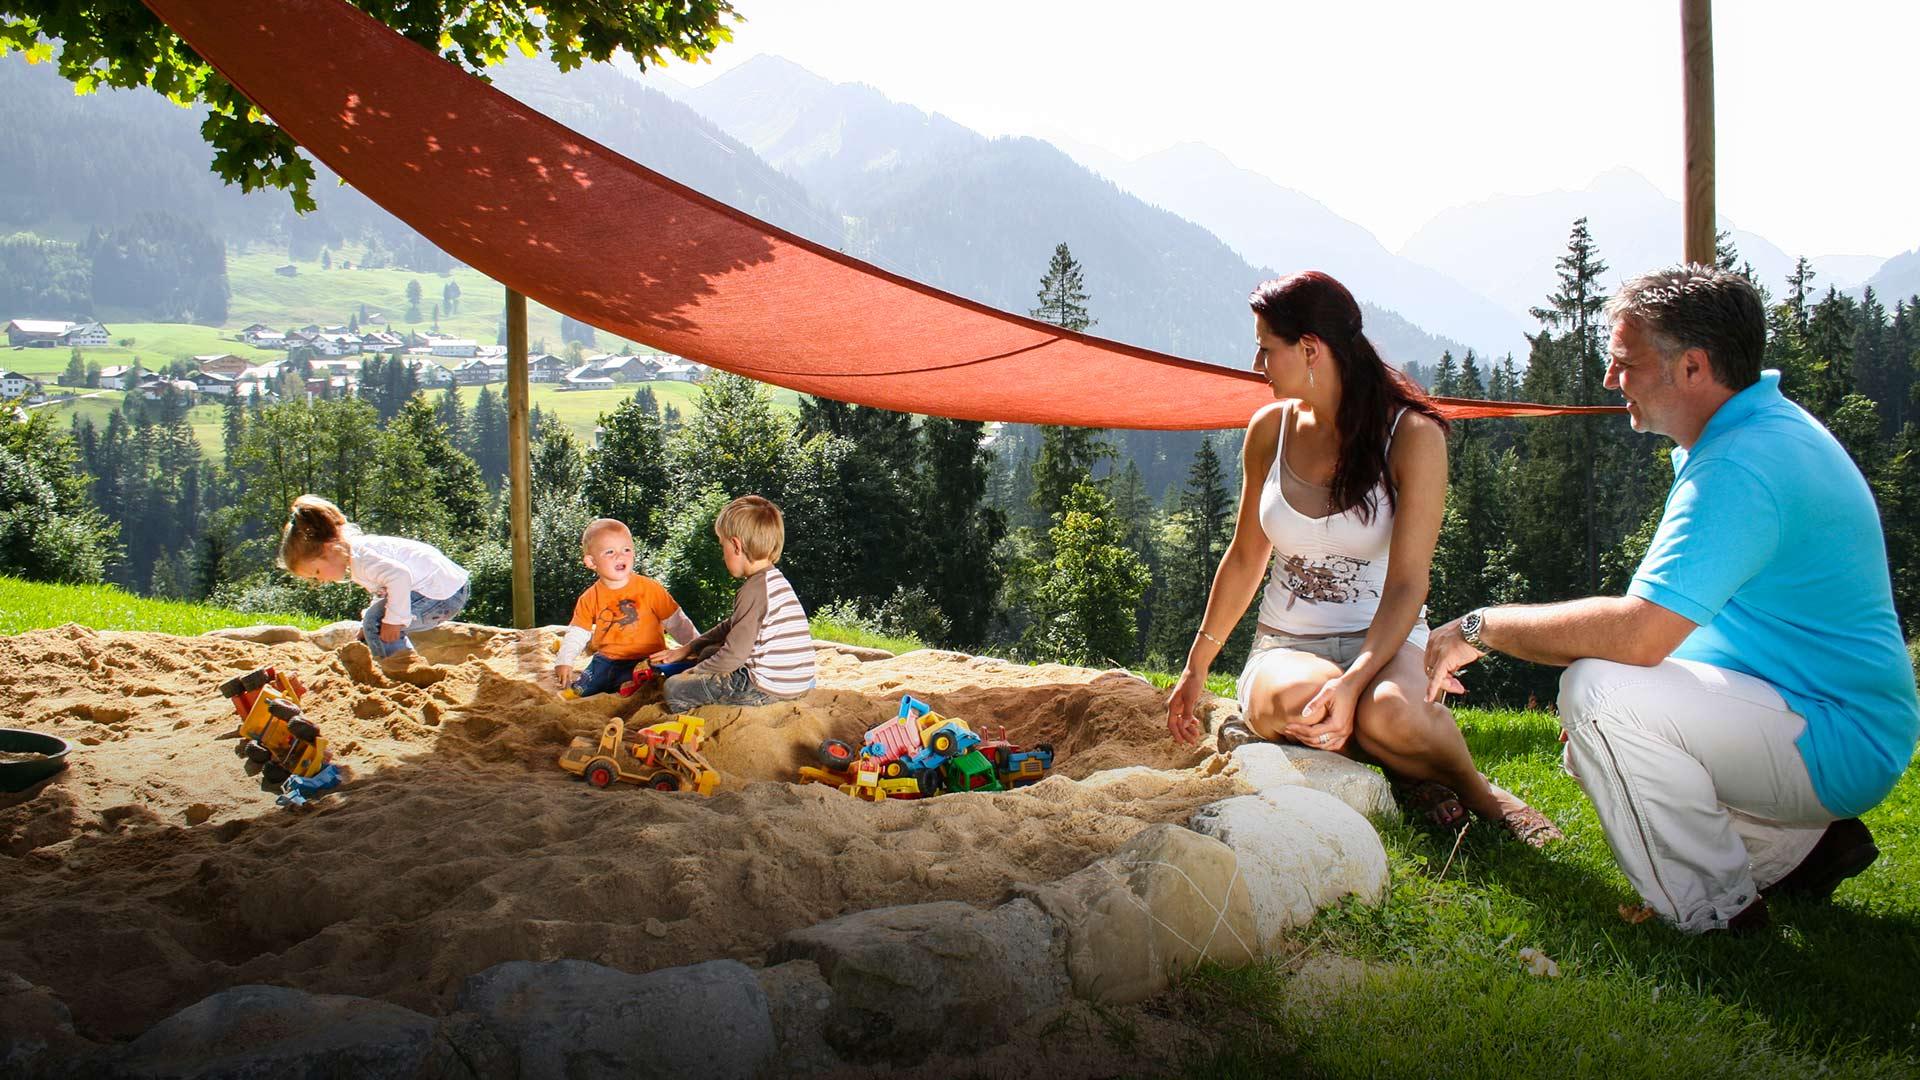 Familienurlaub im Kleinwalsertal